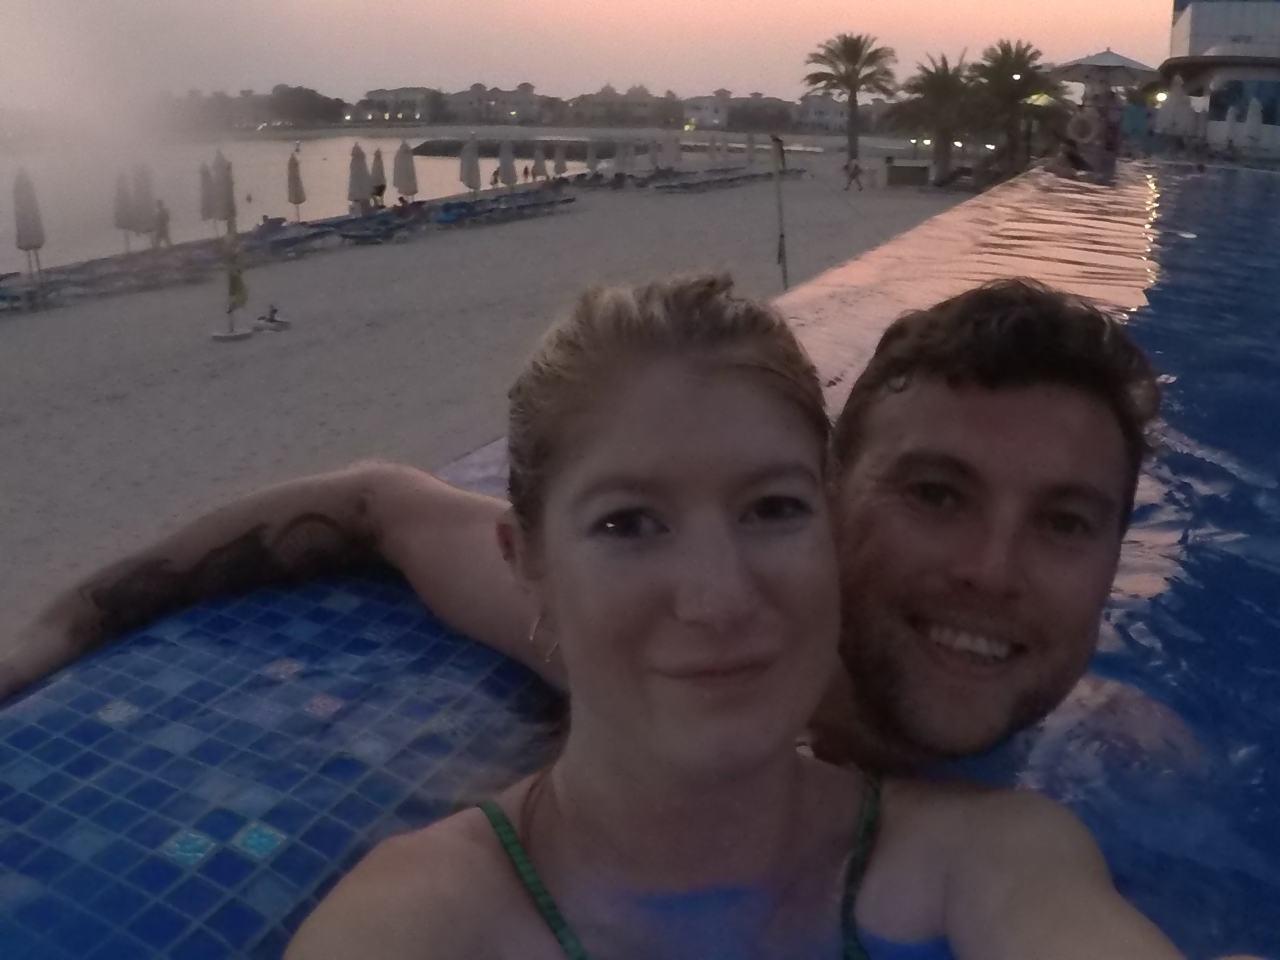 Duke's the palm pool and beach